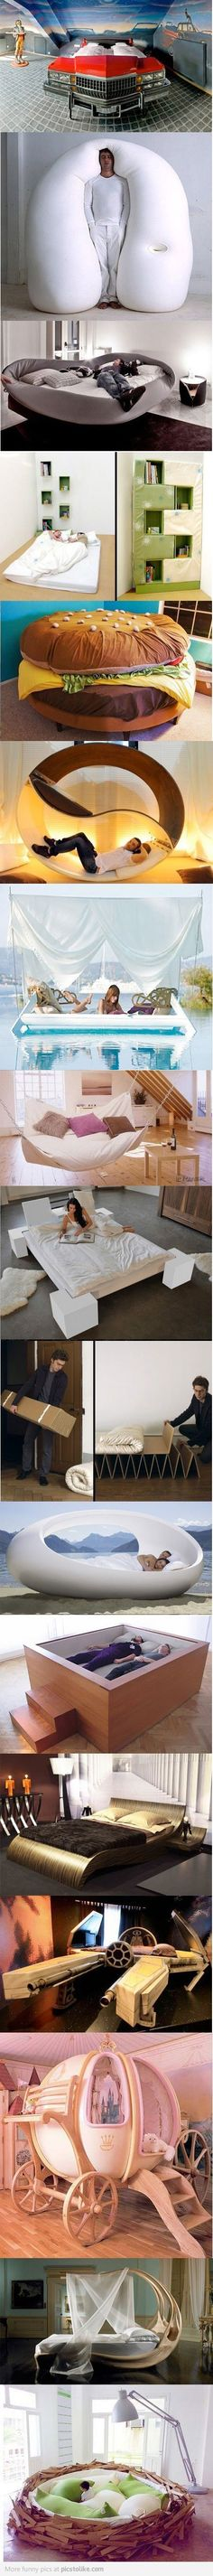 bed designs!